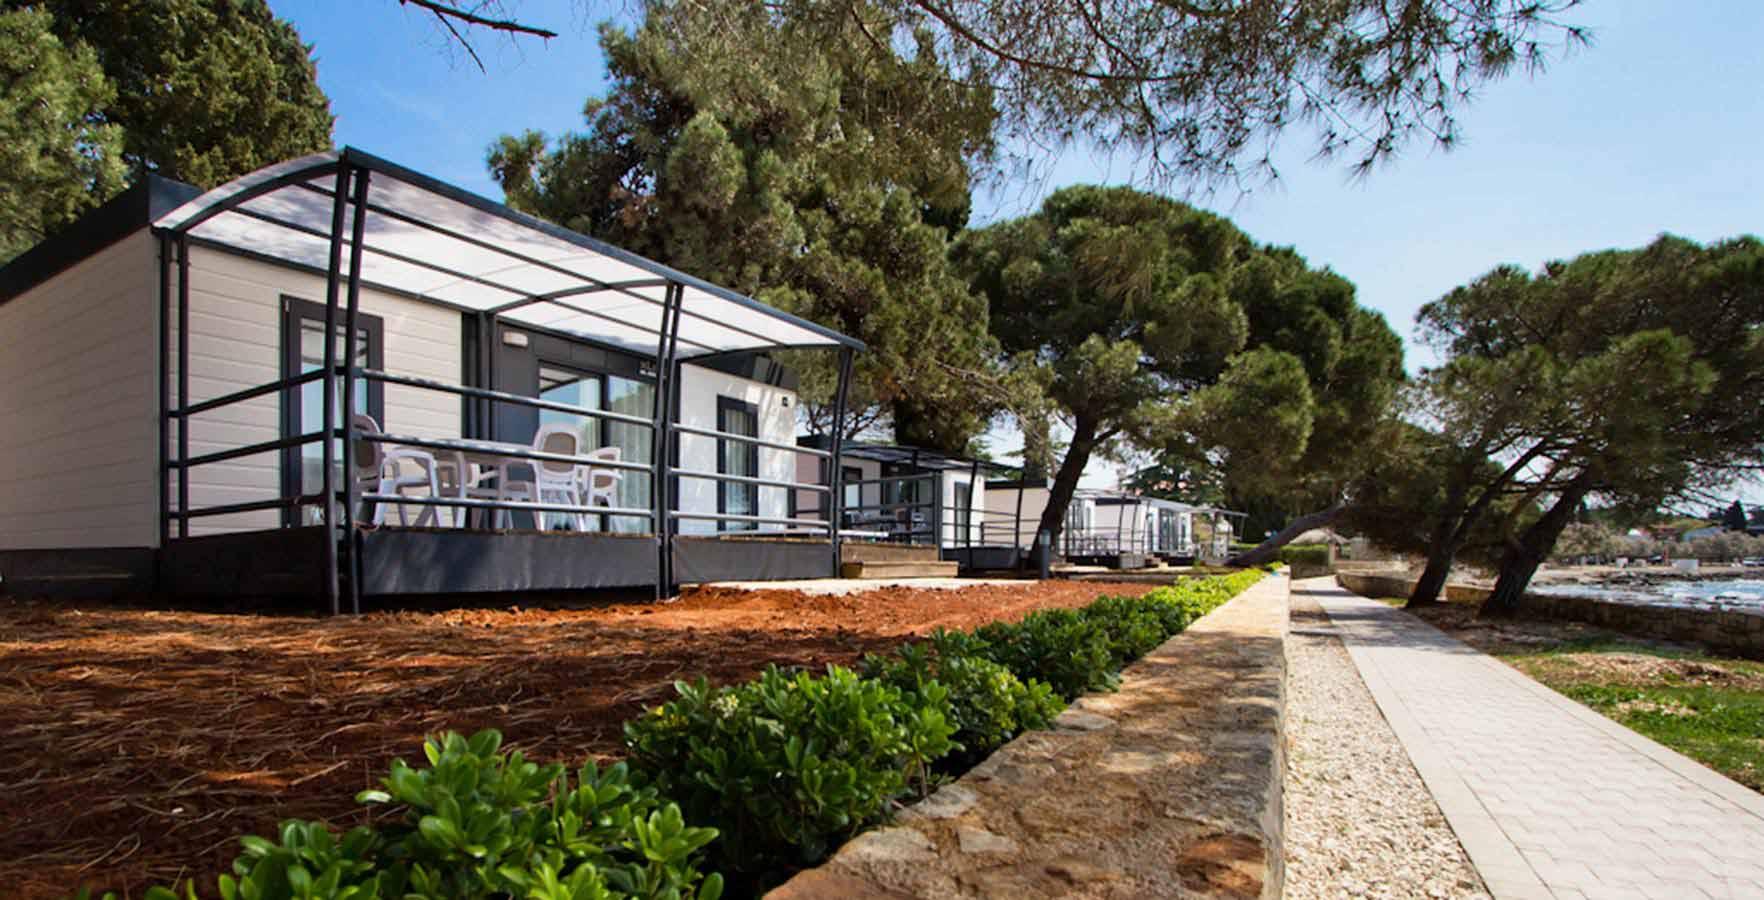 campingplatz materada village campingverband kroatien. Black Bedroom Furniture Sets. Home Design Ideas